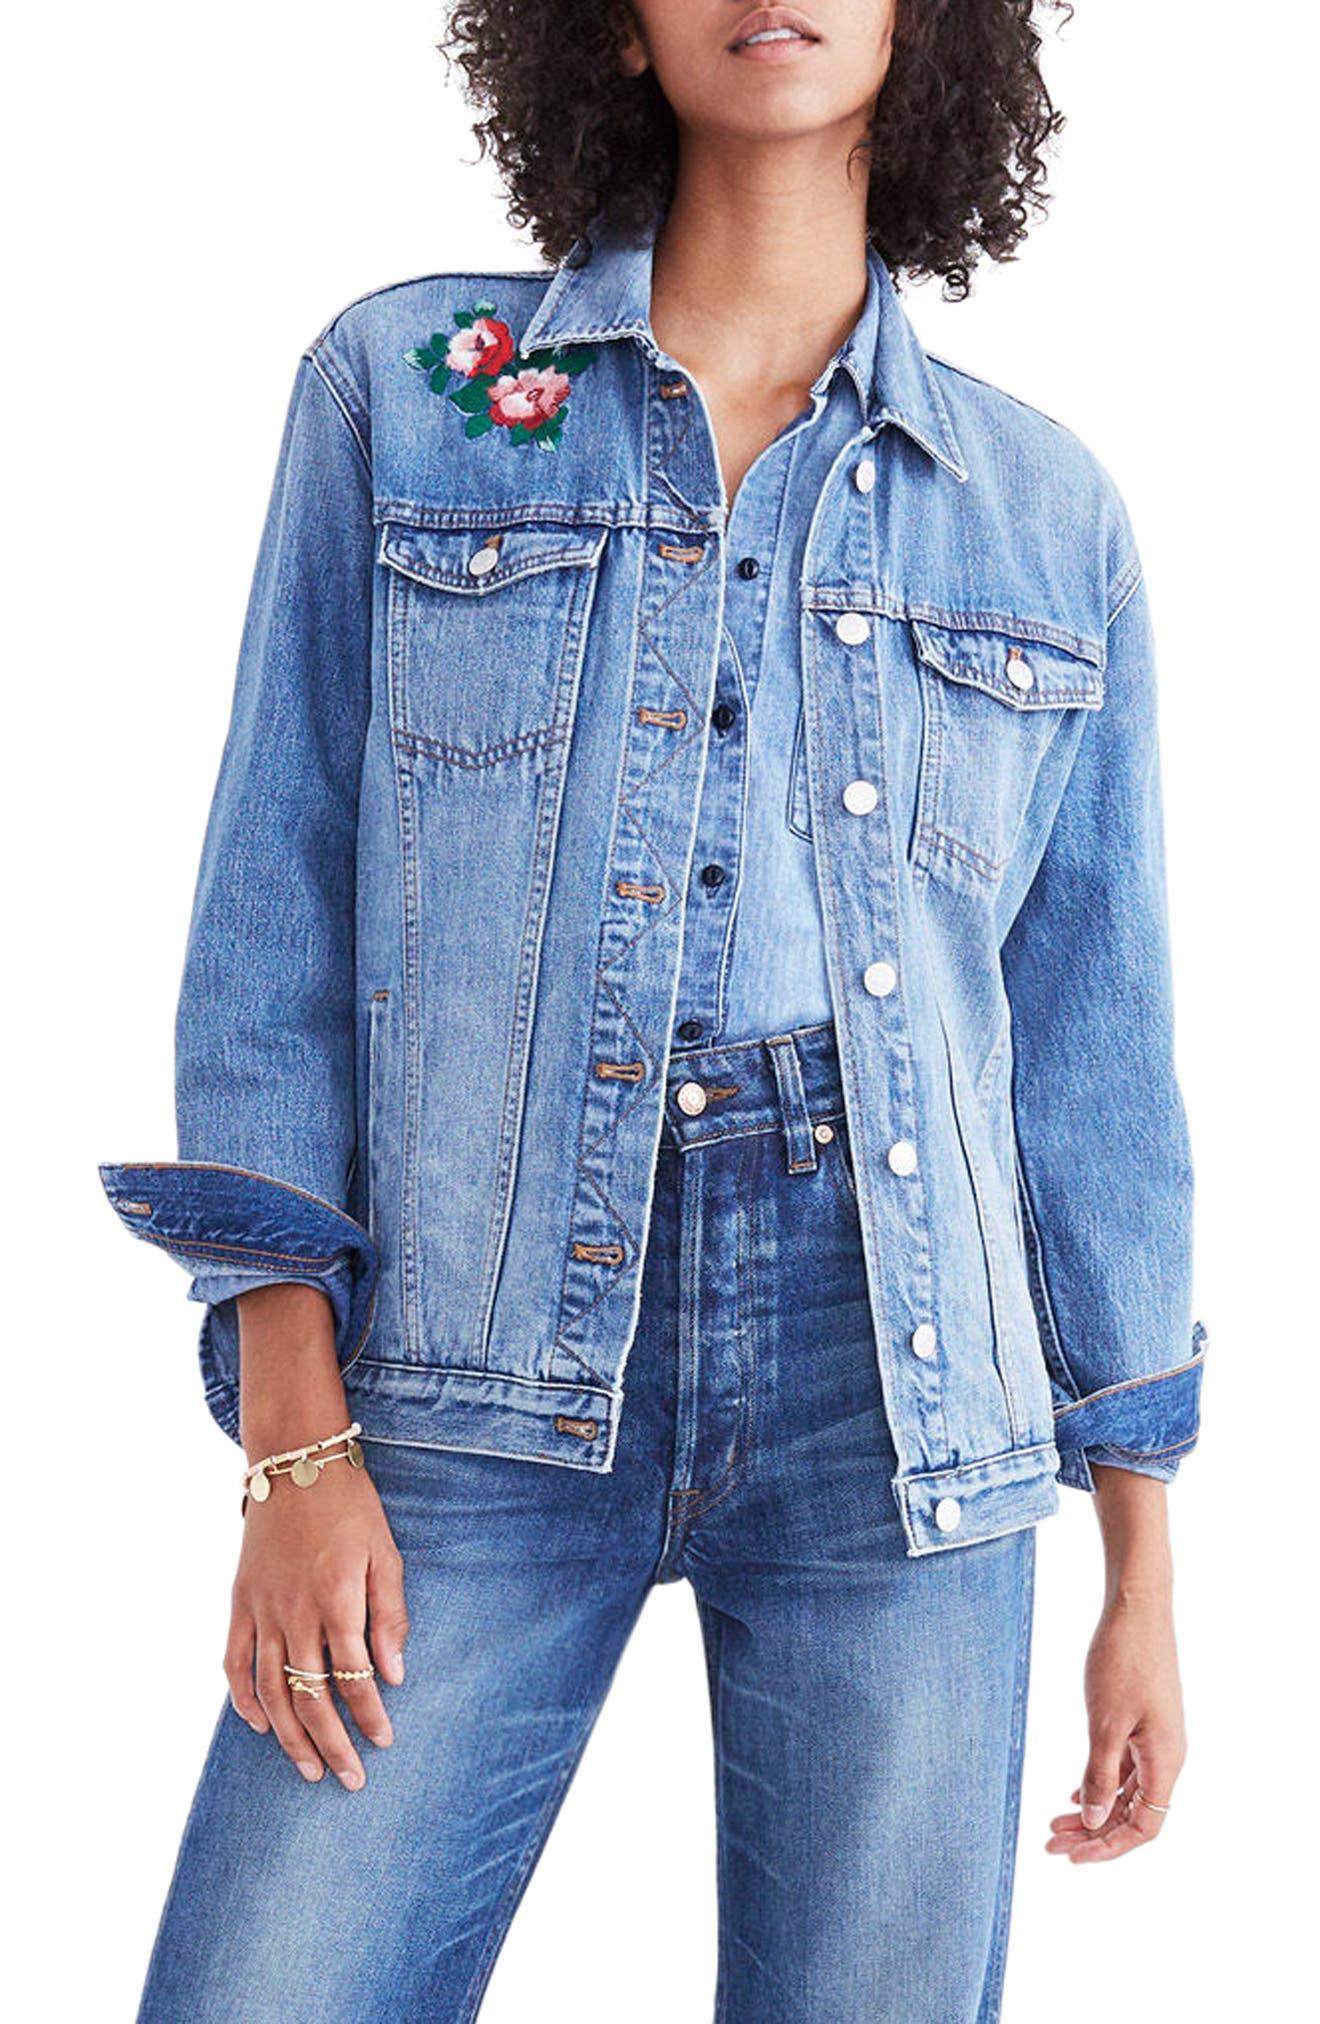 Alternate Image 1 Selected - Madewell Embroidered Denim Jacket